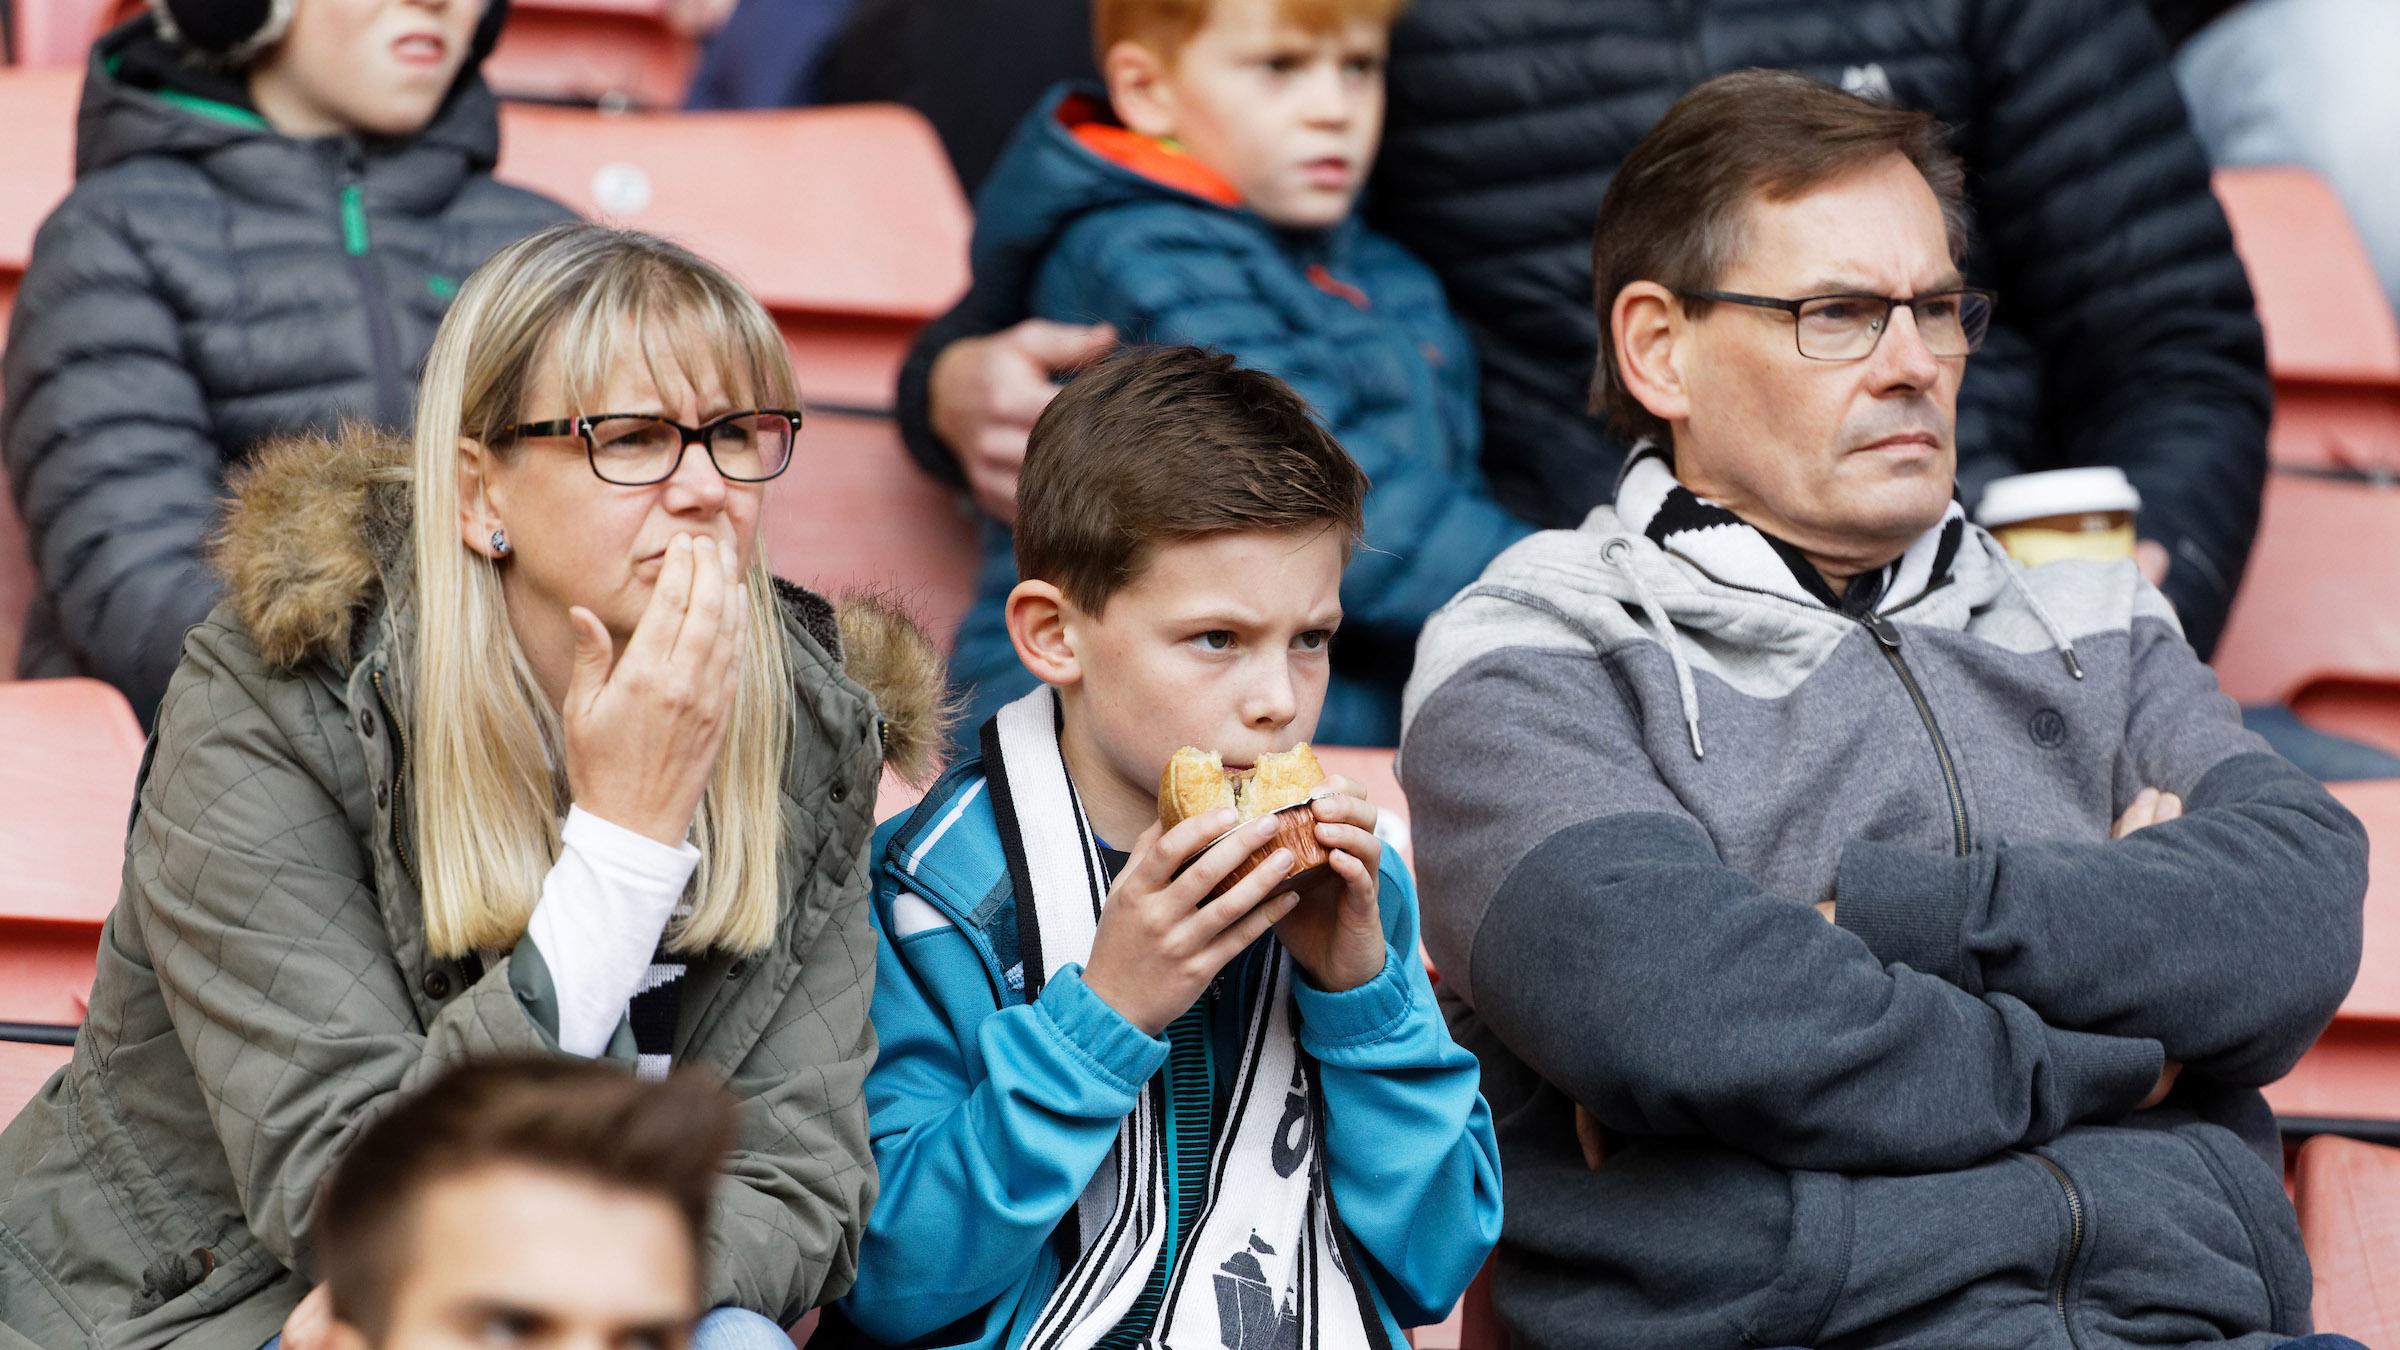 Swansea City fans at Barnsley